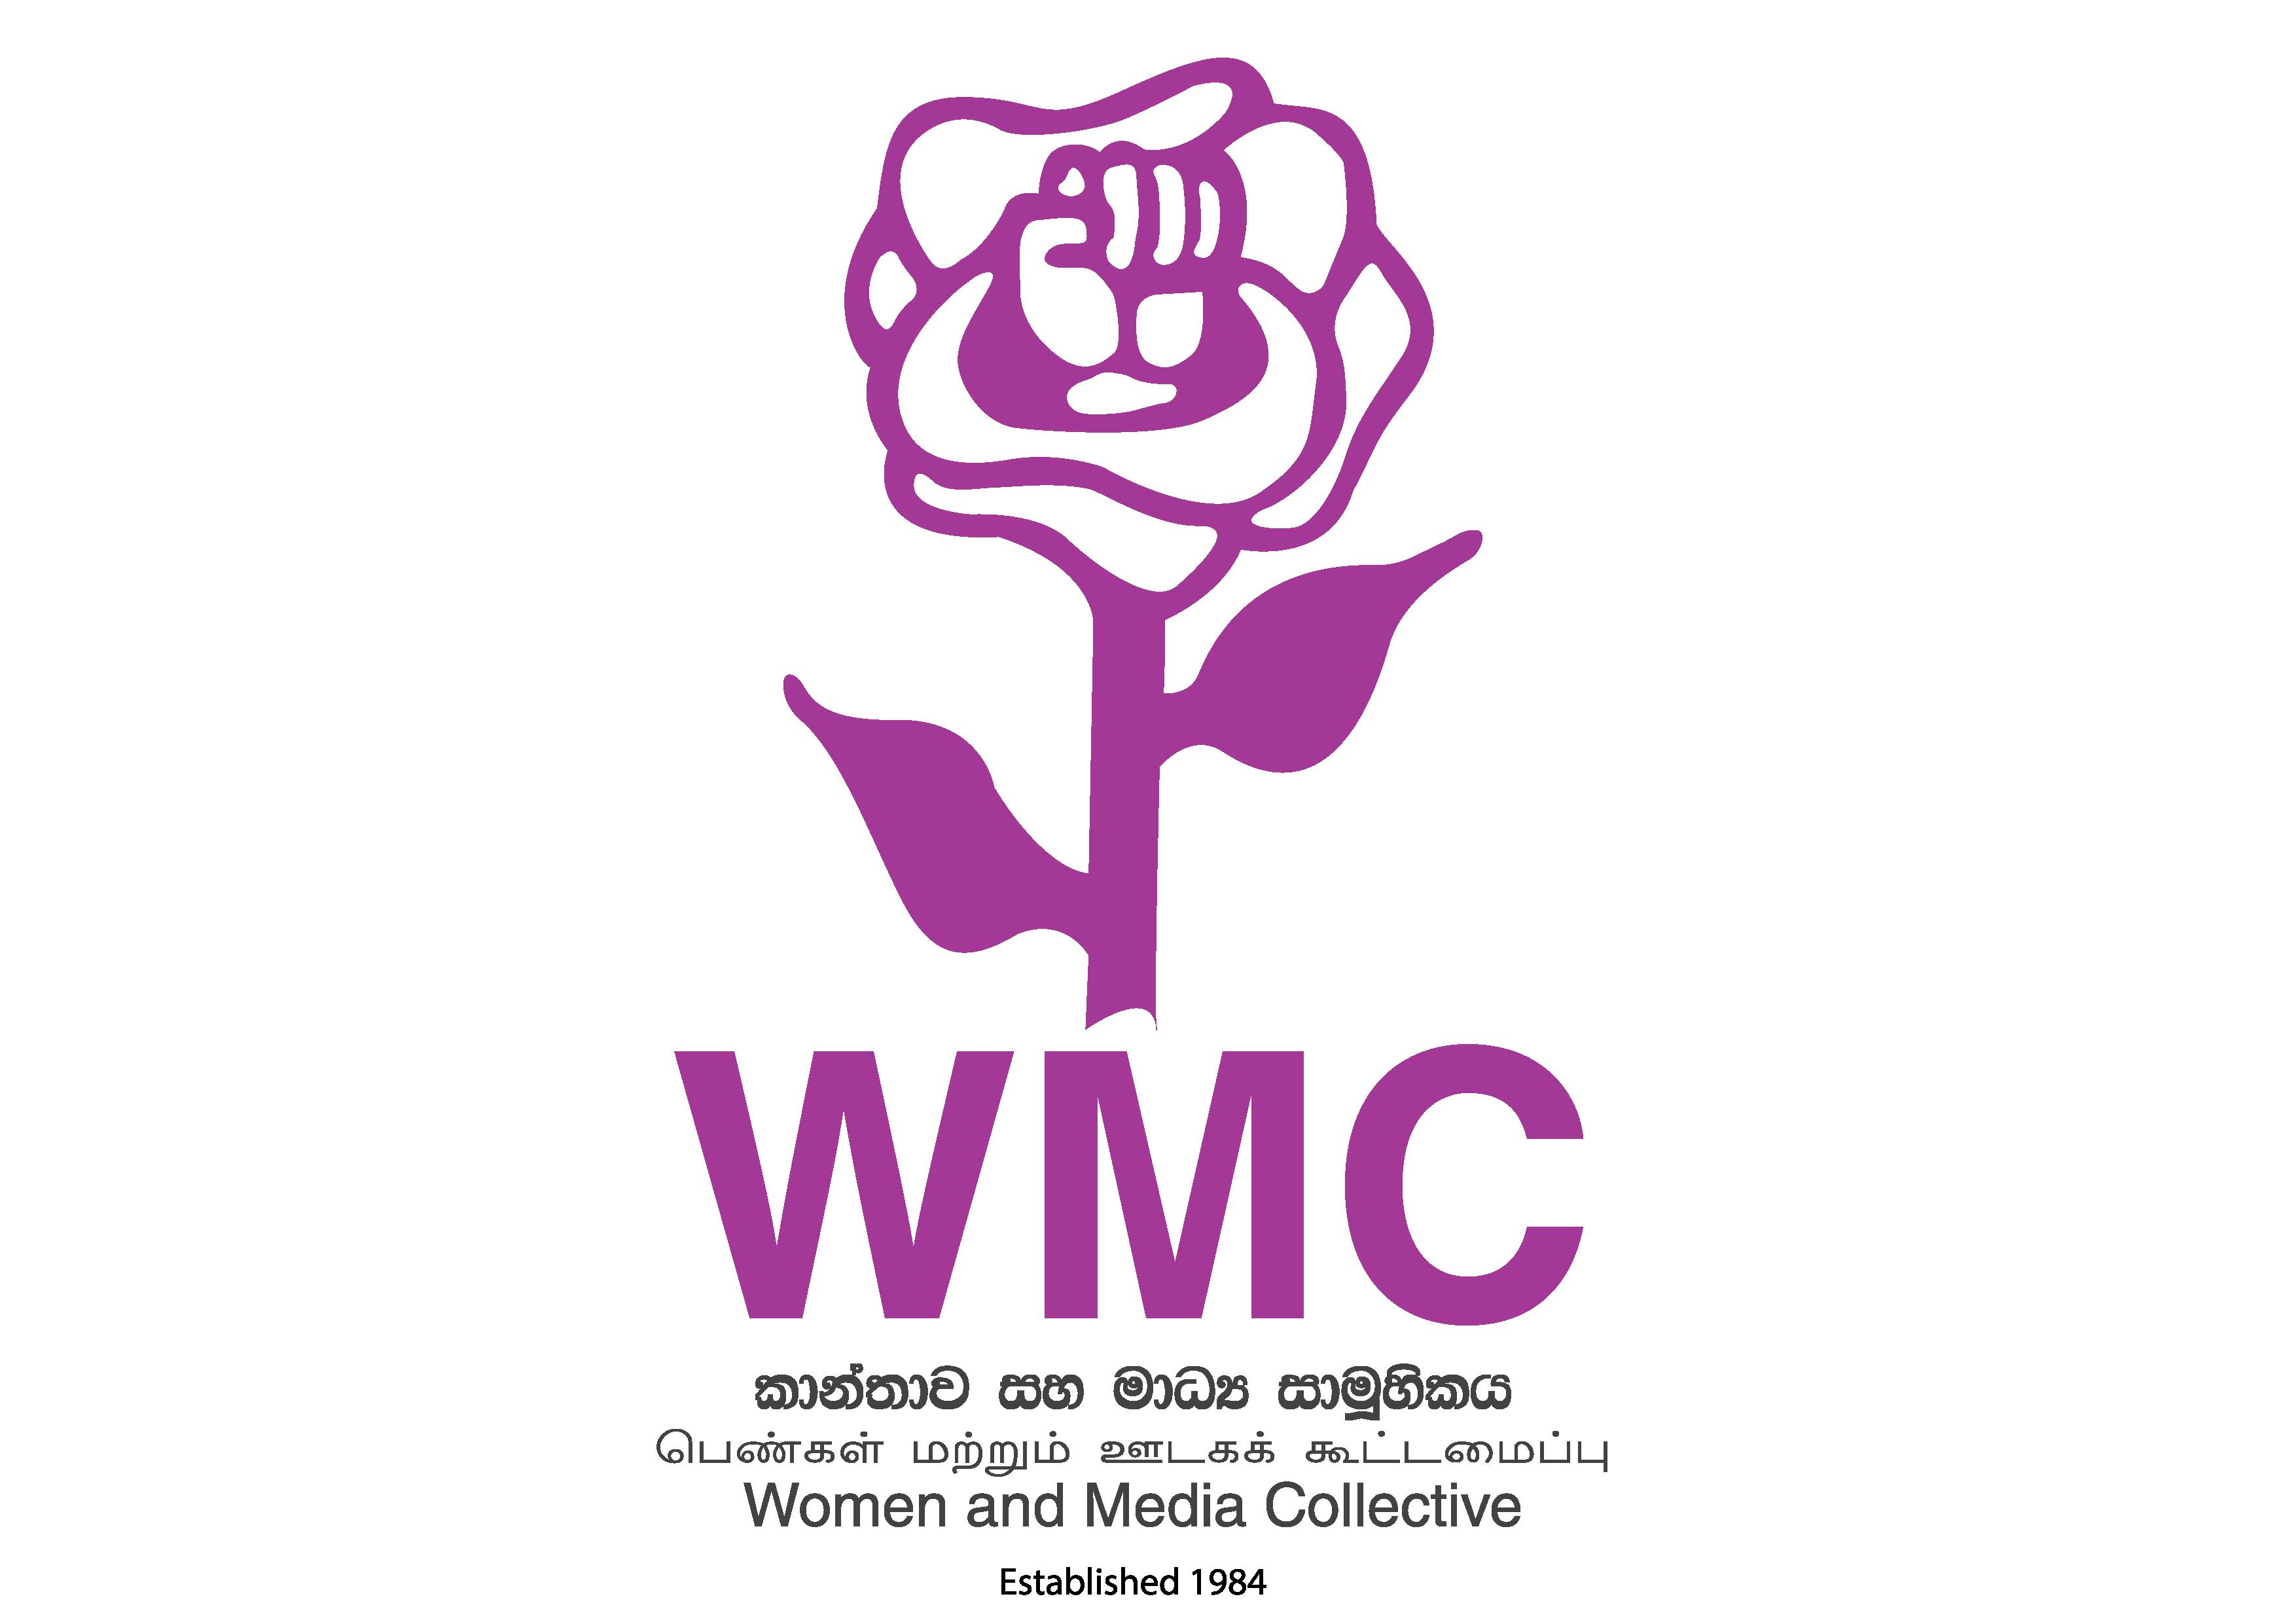 https://assets.roar.media/assets/DFbib2veVXNw7czs_Center-Logo-With-WMS-(Purple-Font)-01.png